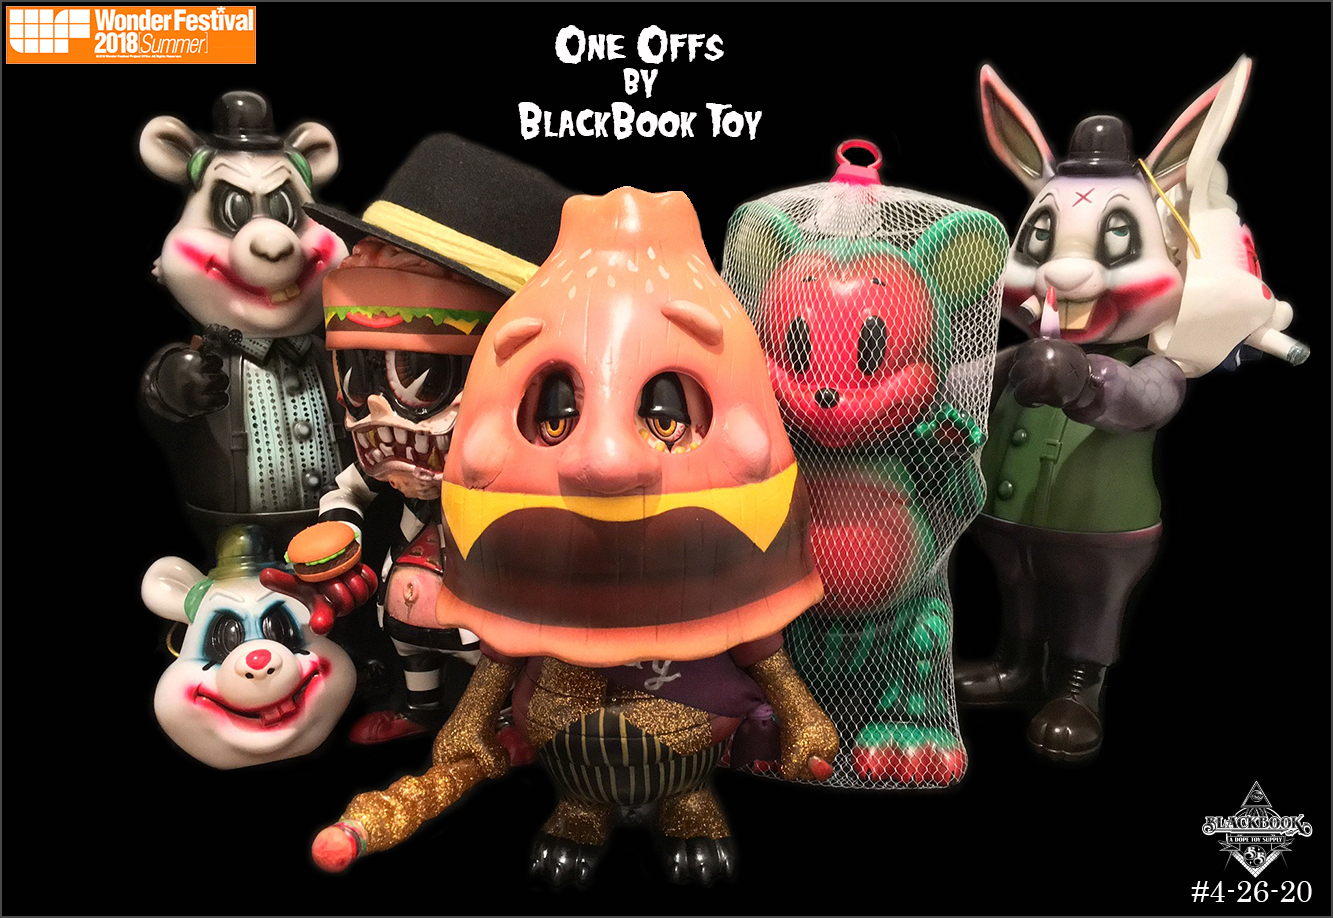 One offs by BlackBook Toy for Wonder Fest